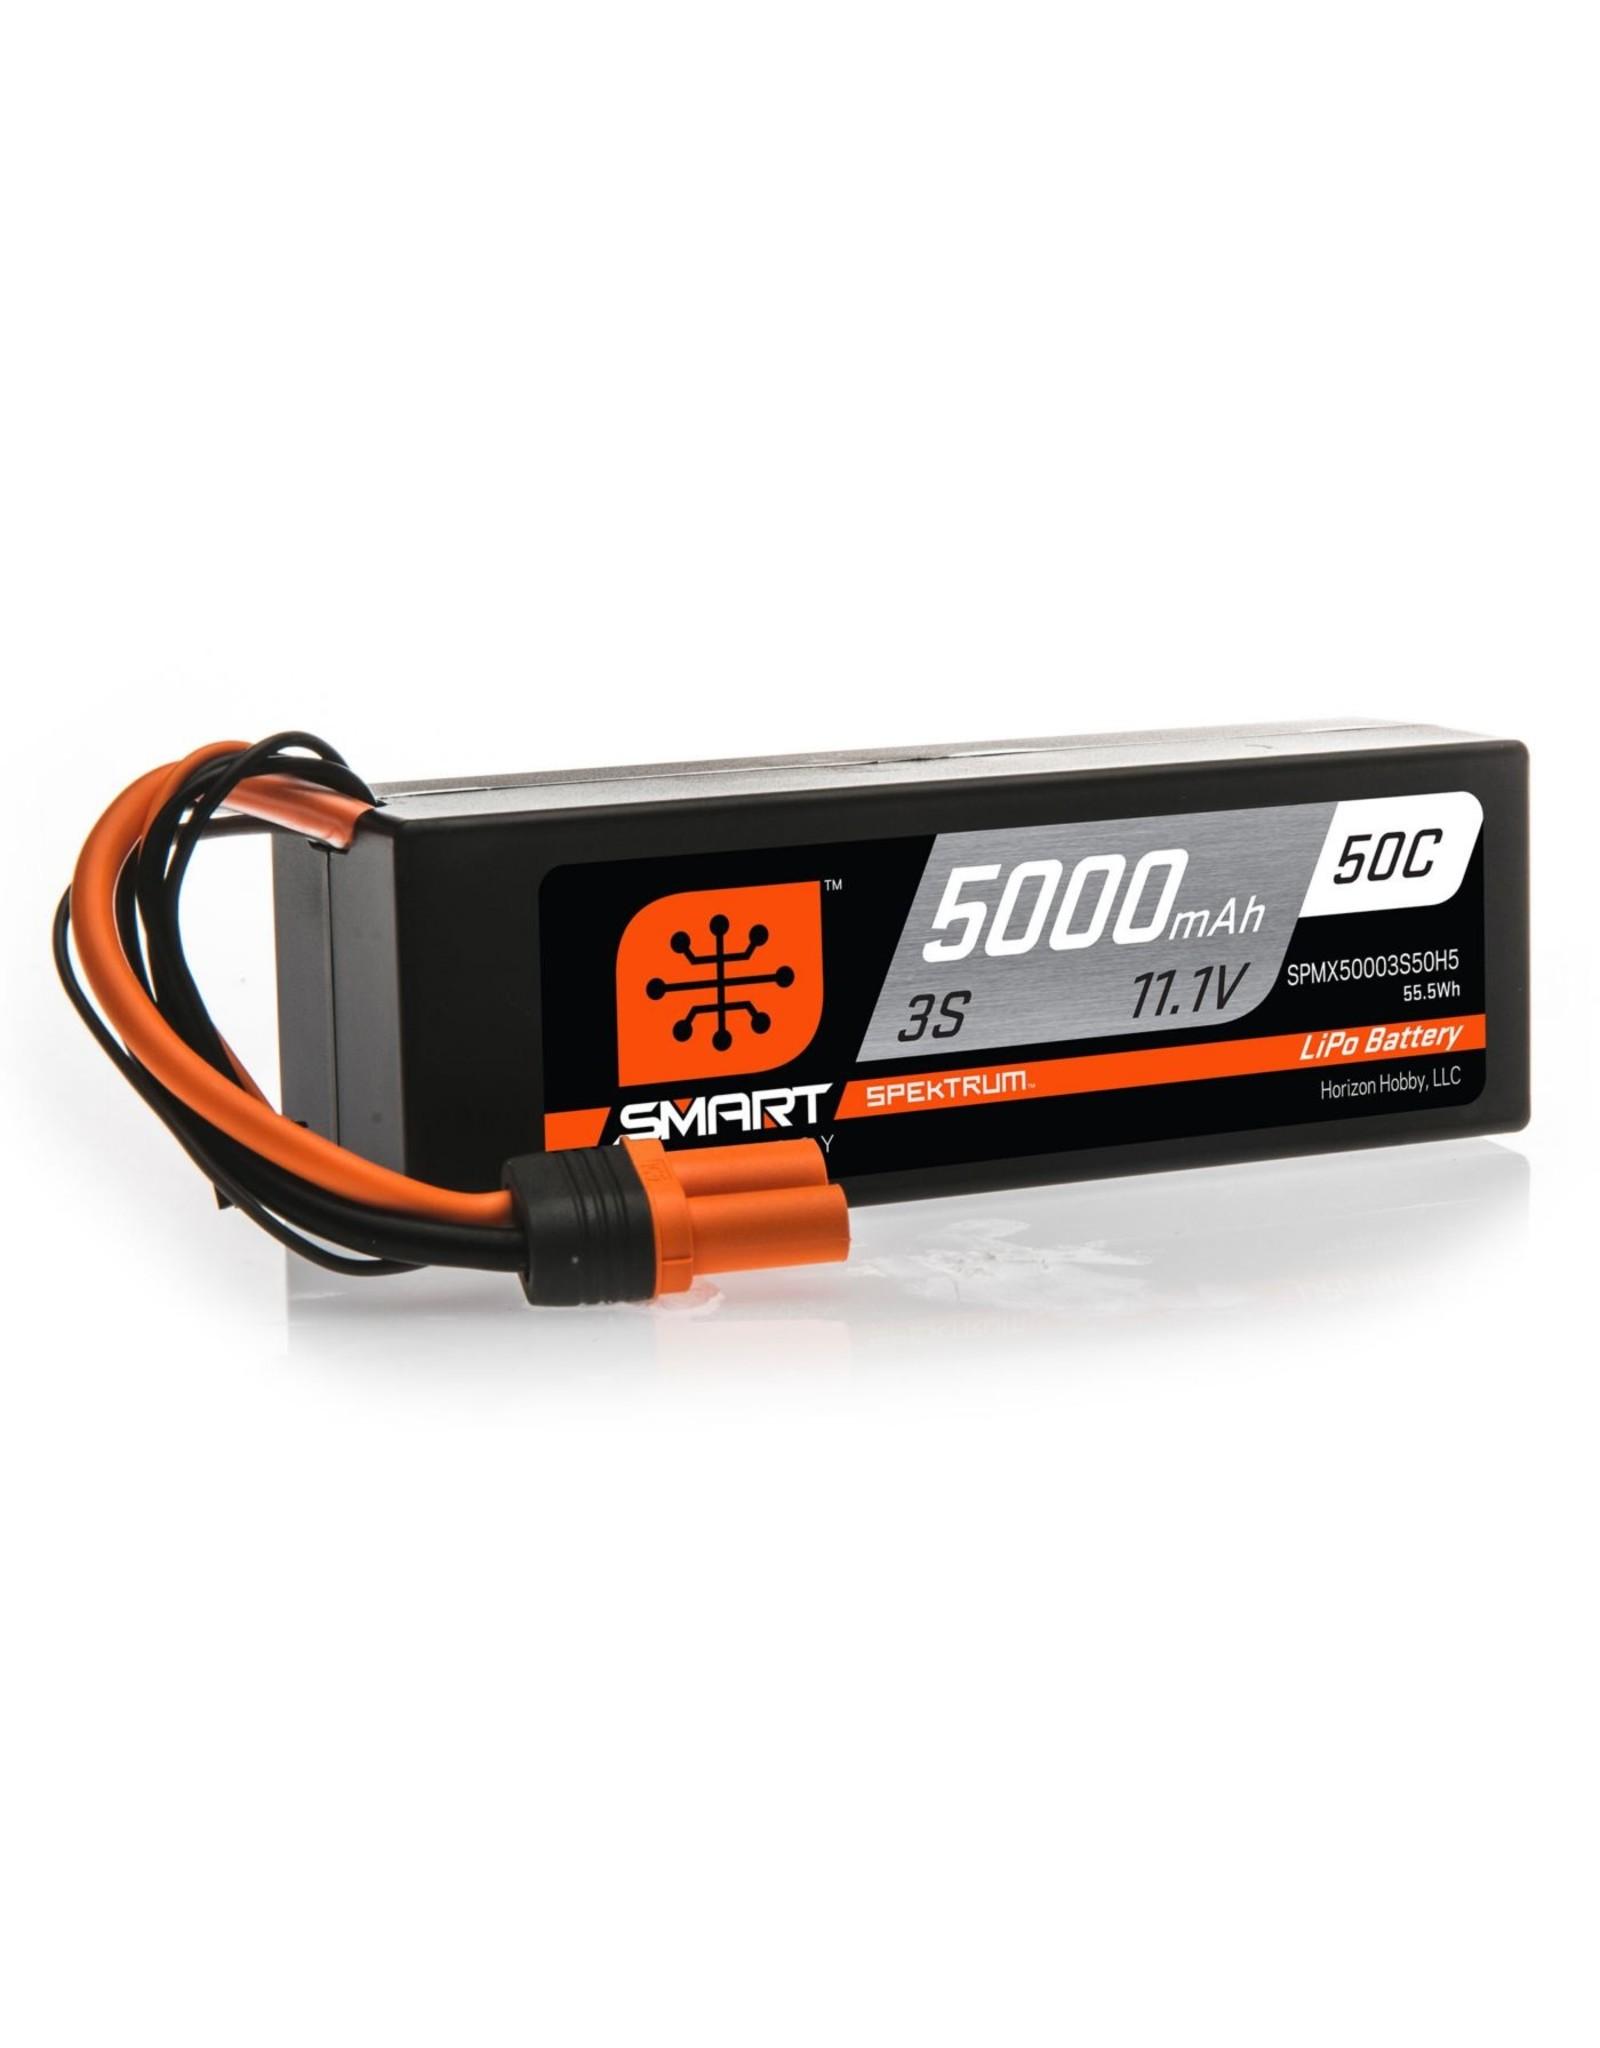 Spektrum SPMX50003S50H5 - 11.1V 5000mAh 3S 50C Smart Hardcase LiPo Battery: IC5